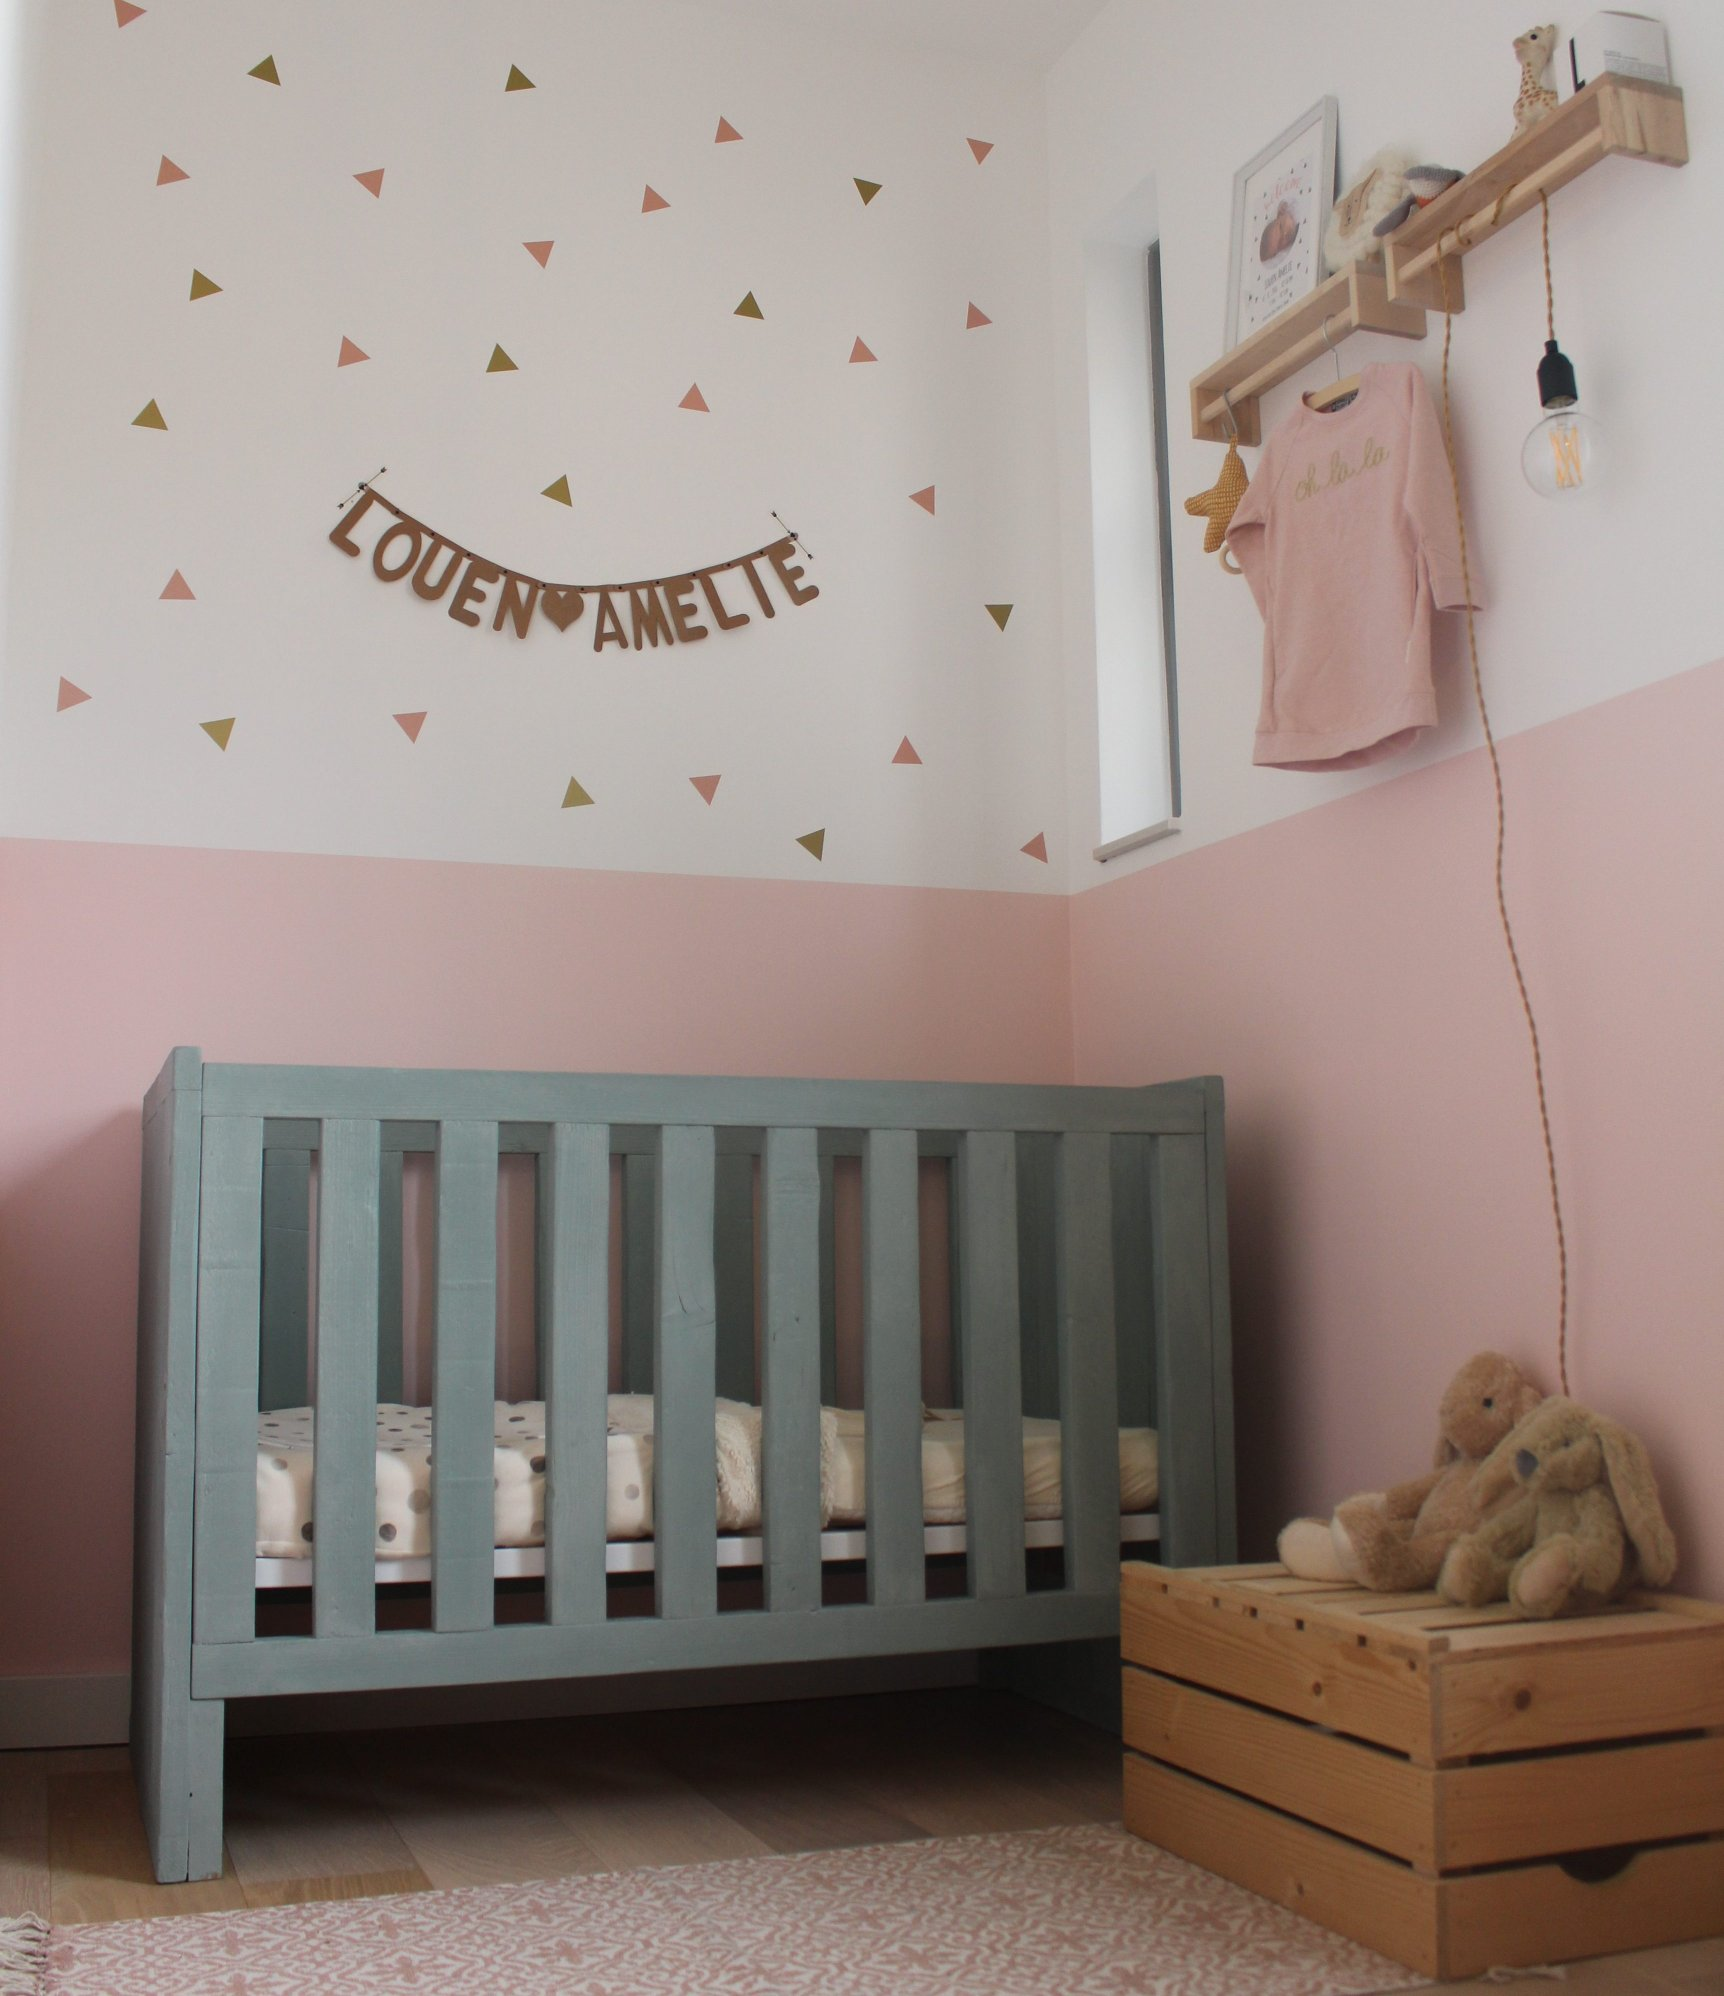 kinderkamer ideeen duurzaam meisjeskamer